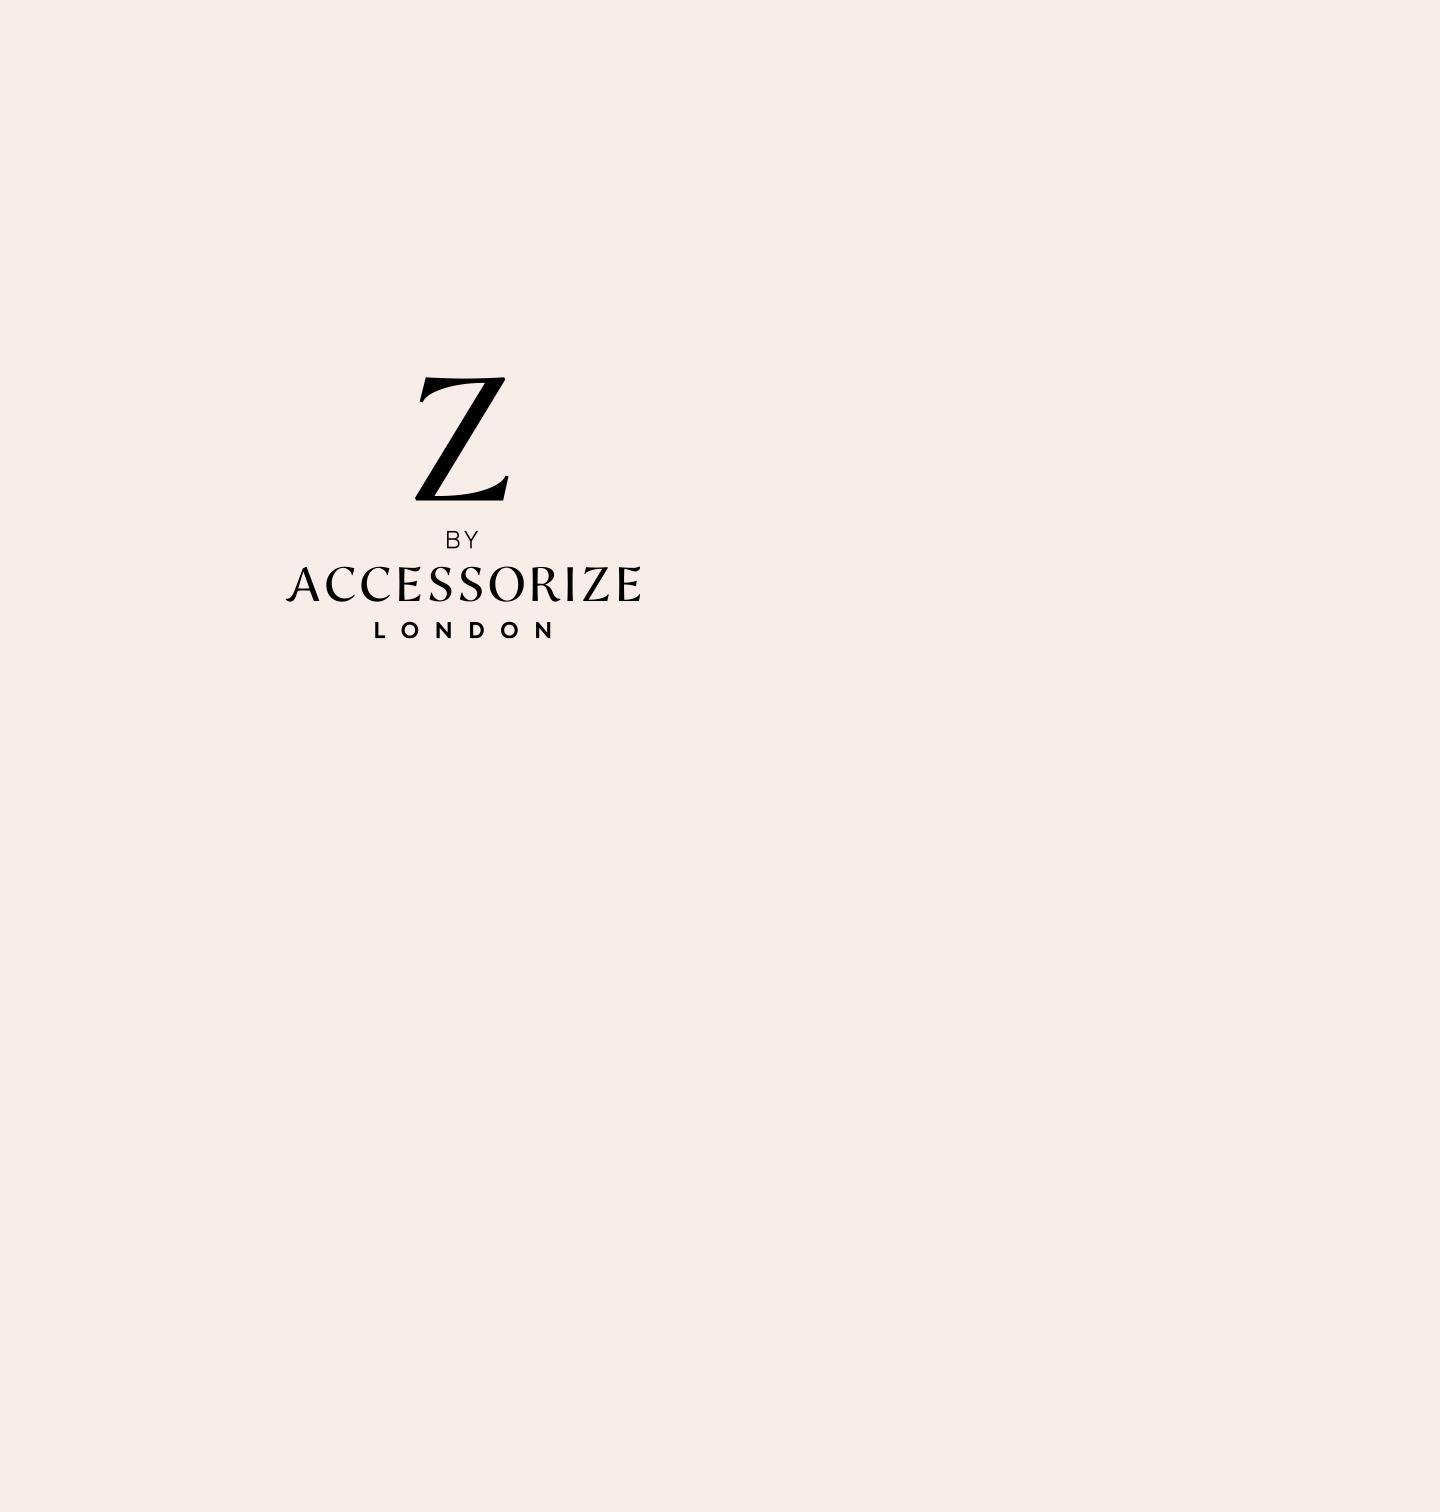 Accessorize Z